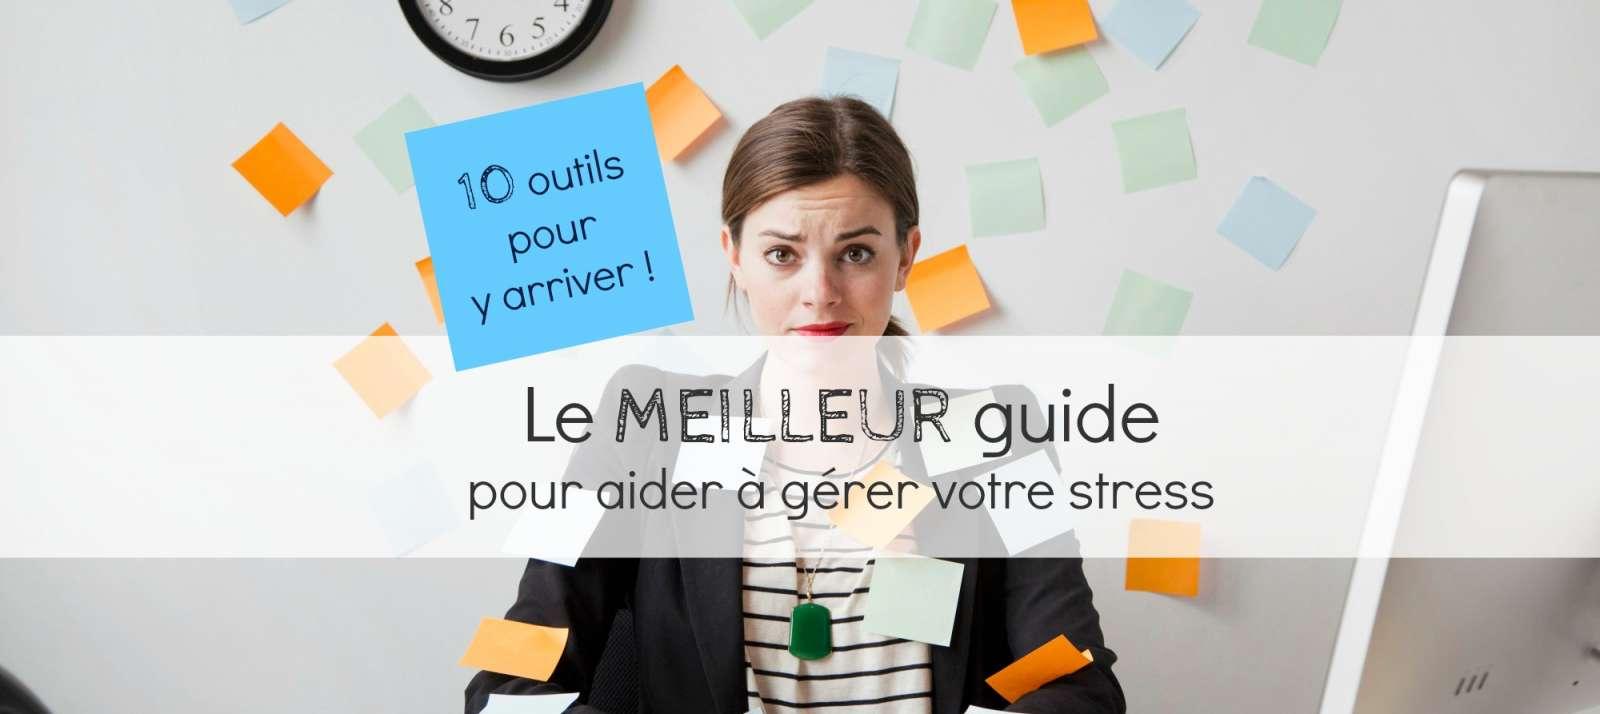 Gestion du stress Julie Ouimet